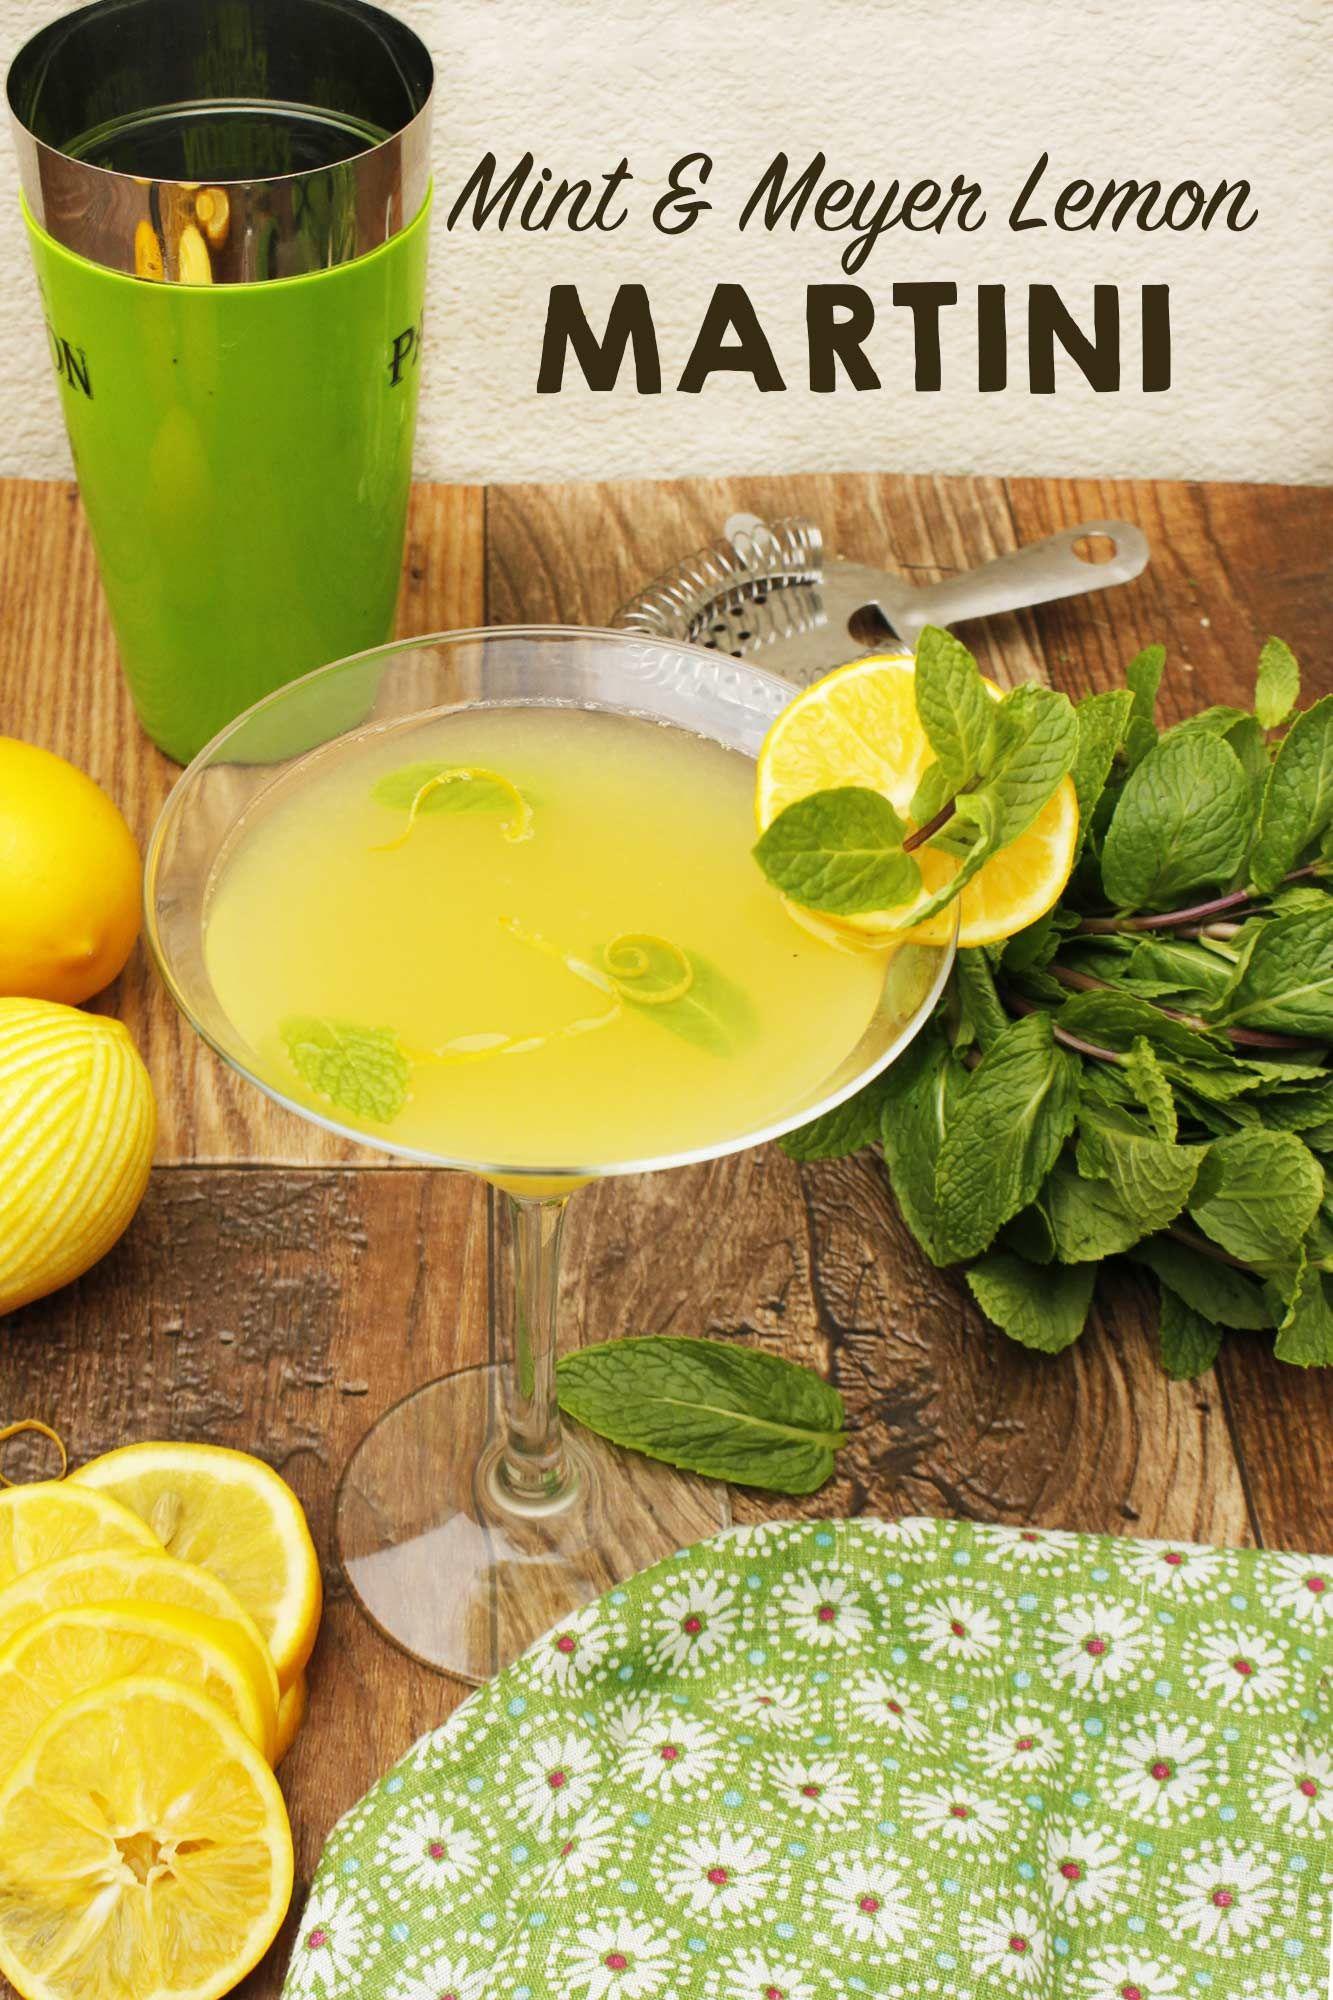 Mint & Meyer Lemon Martini Recipe Spring recipes